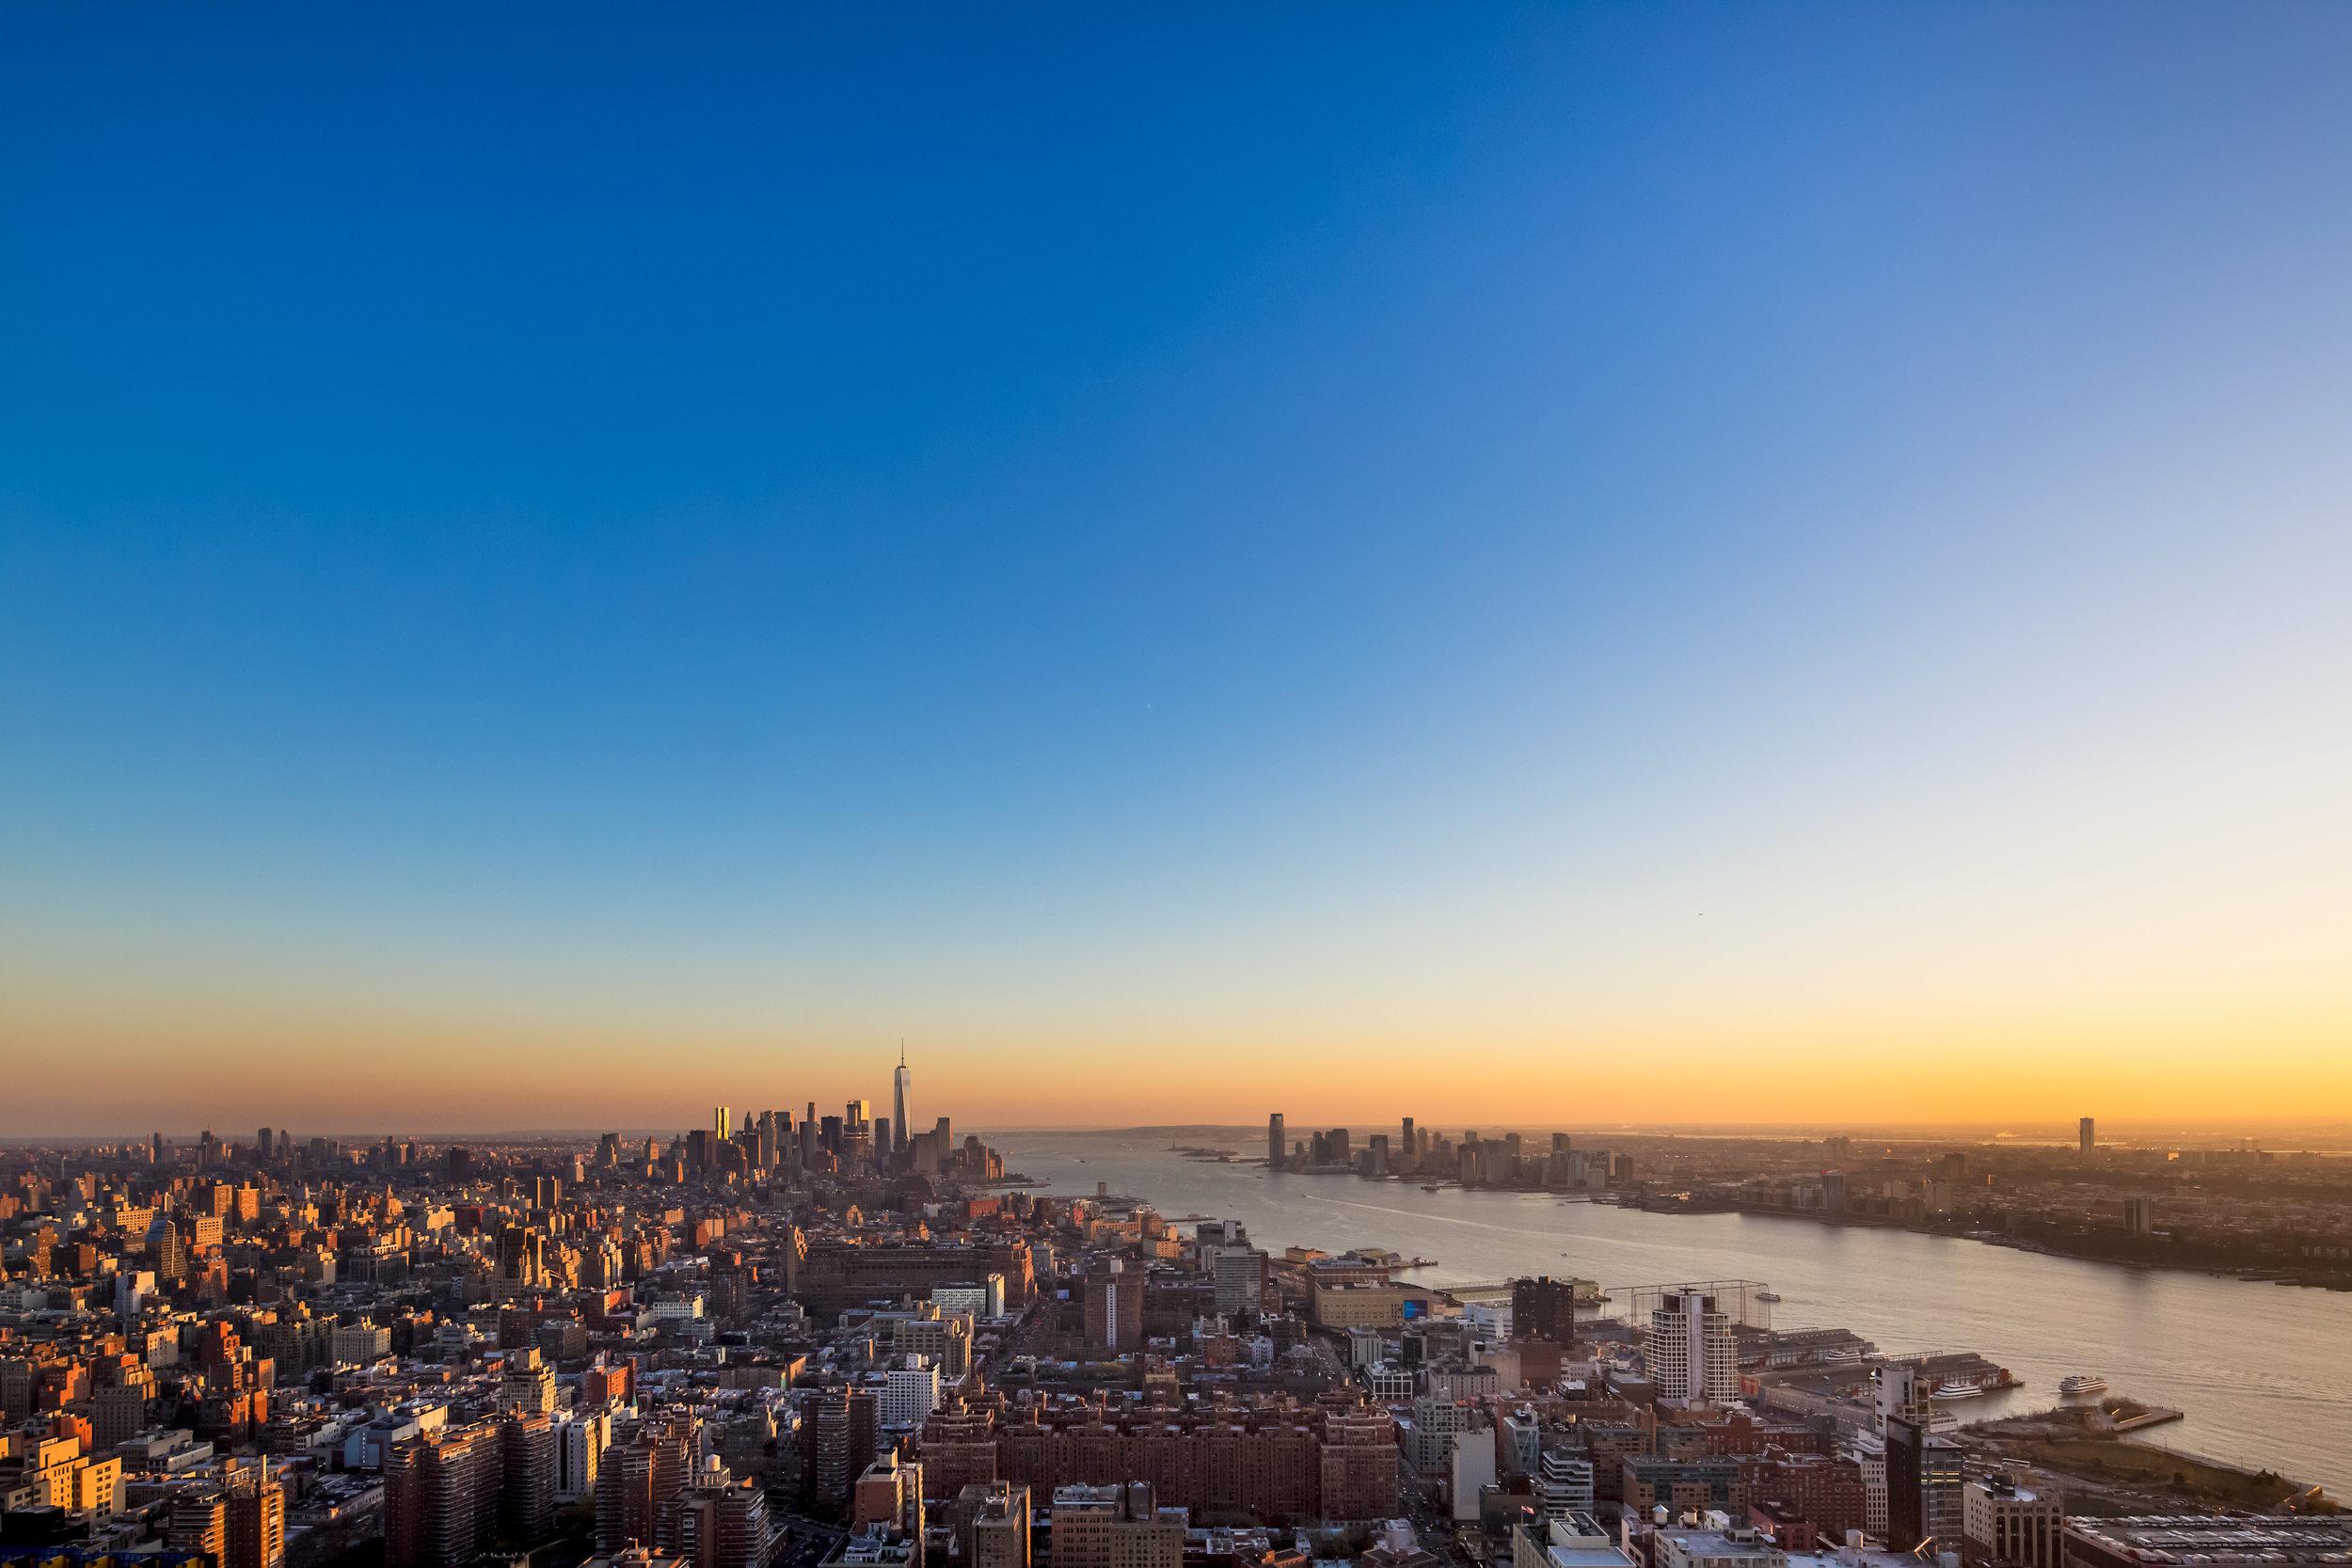 LSNY_City_Views-7.jpg